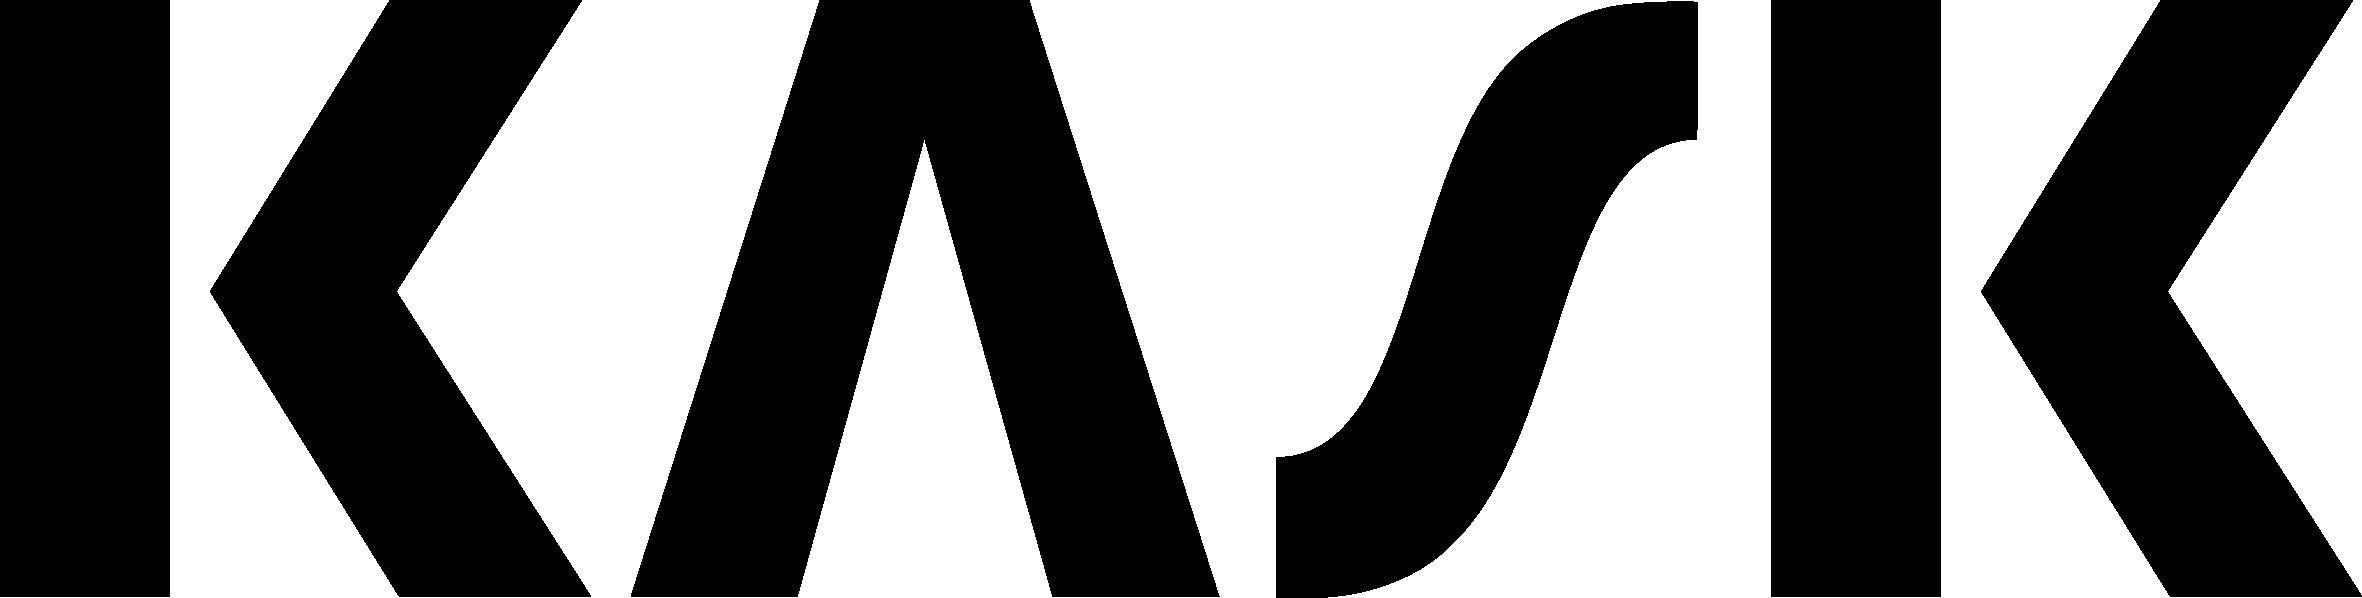 Logo-Kask-2014-Nero-L-10cm-600dpi